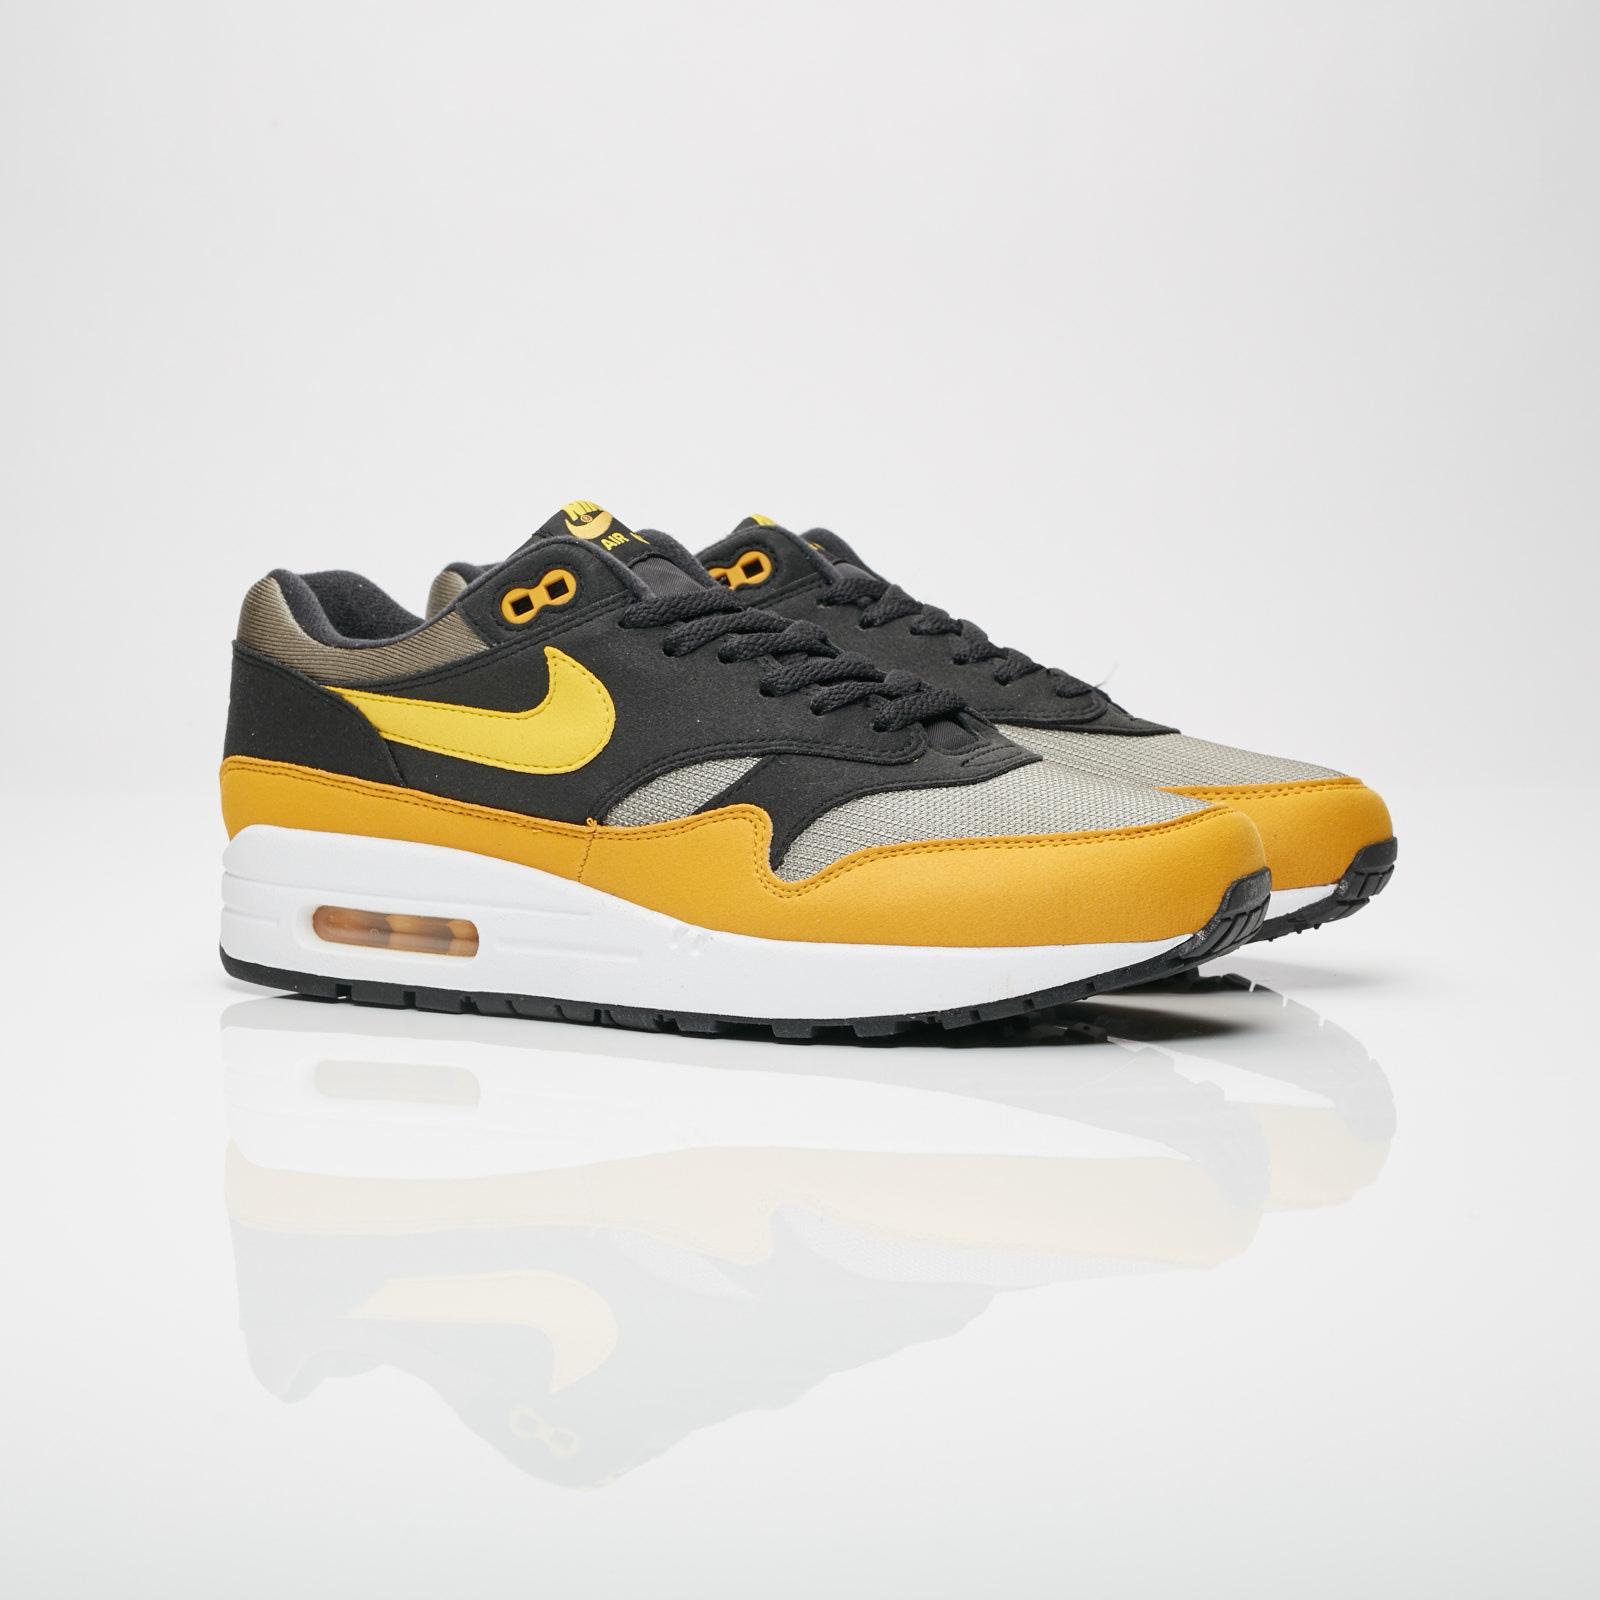 Nike Air Max 1 - Ah8145-001